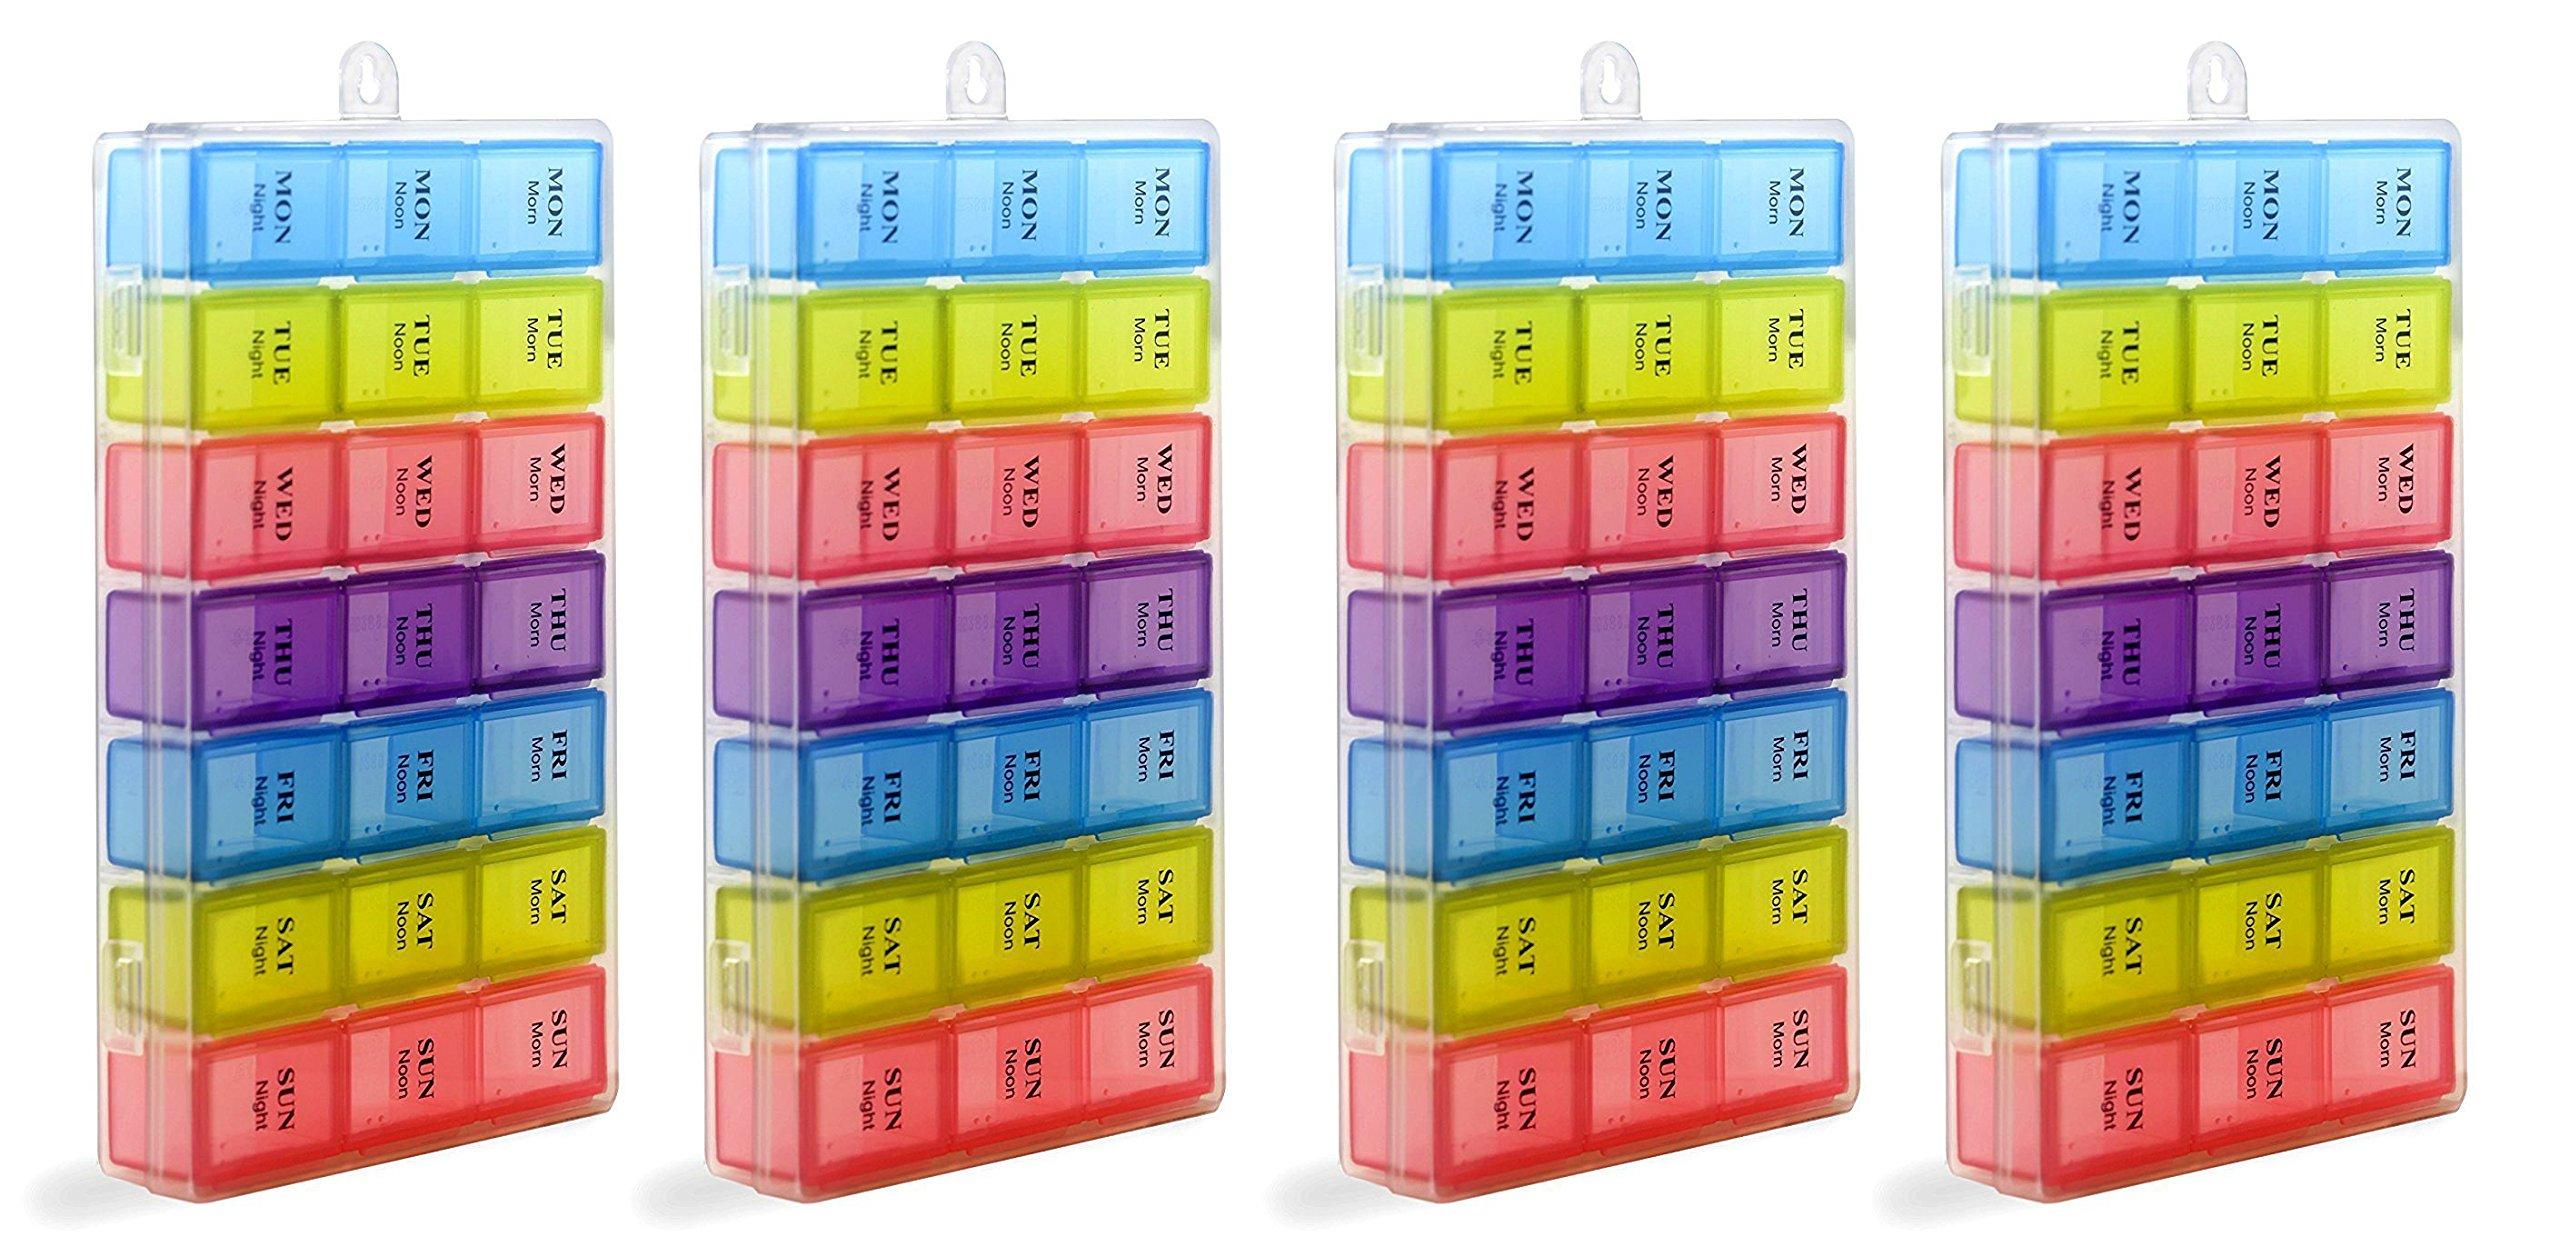 Pill Organizer Box Weekly Case, Medicine Organizer, Vitamin Organizer, Reminder Daily Am PM, Day Night Compartments 7 days (4 items)